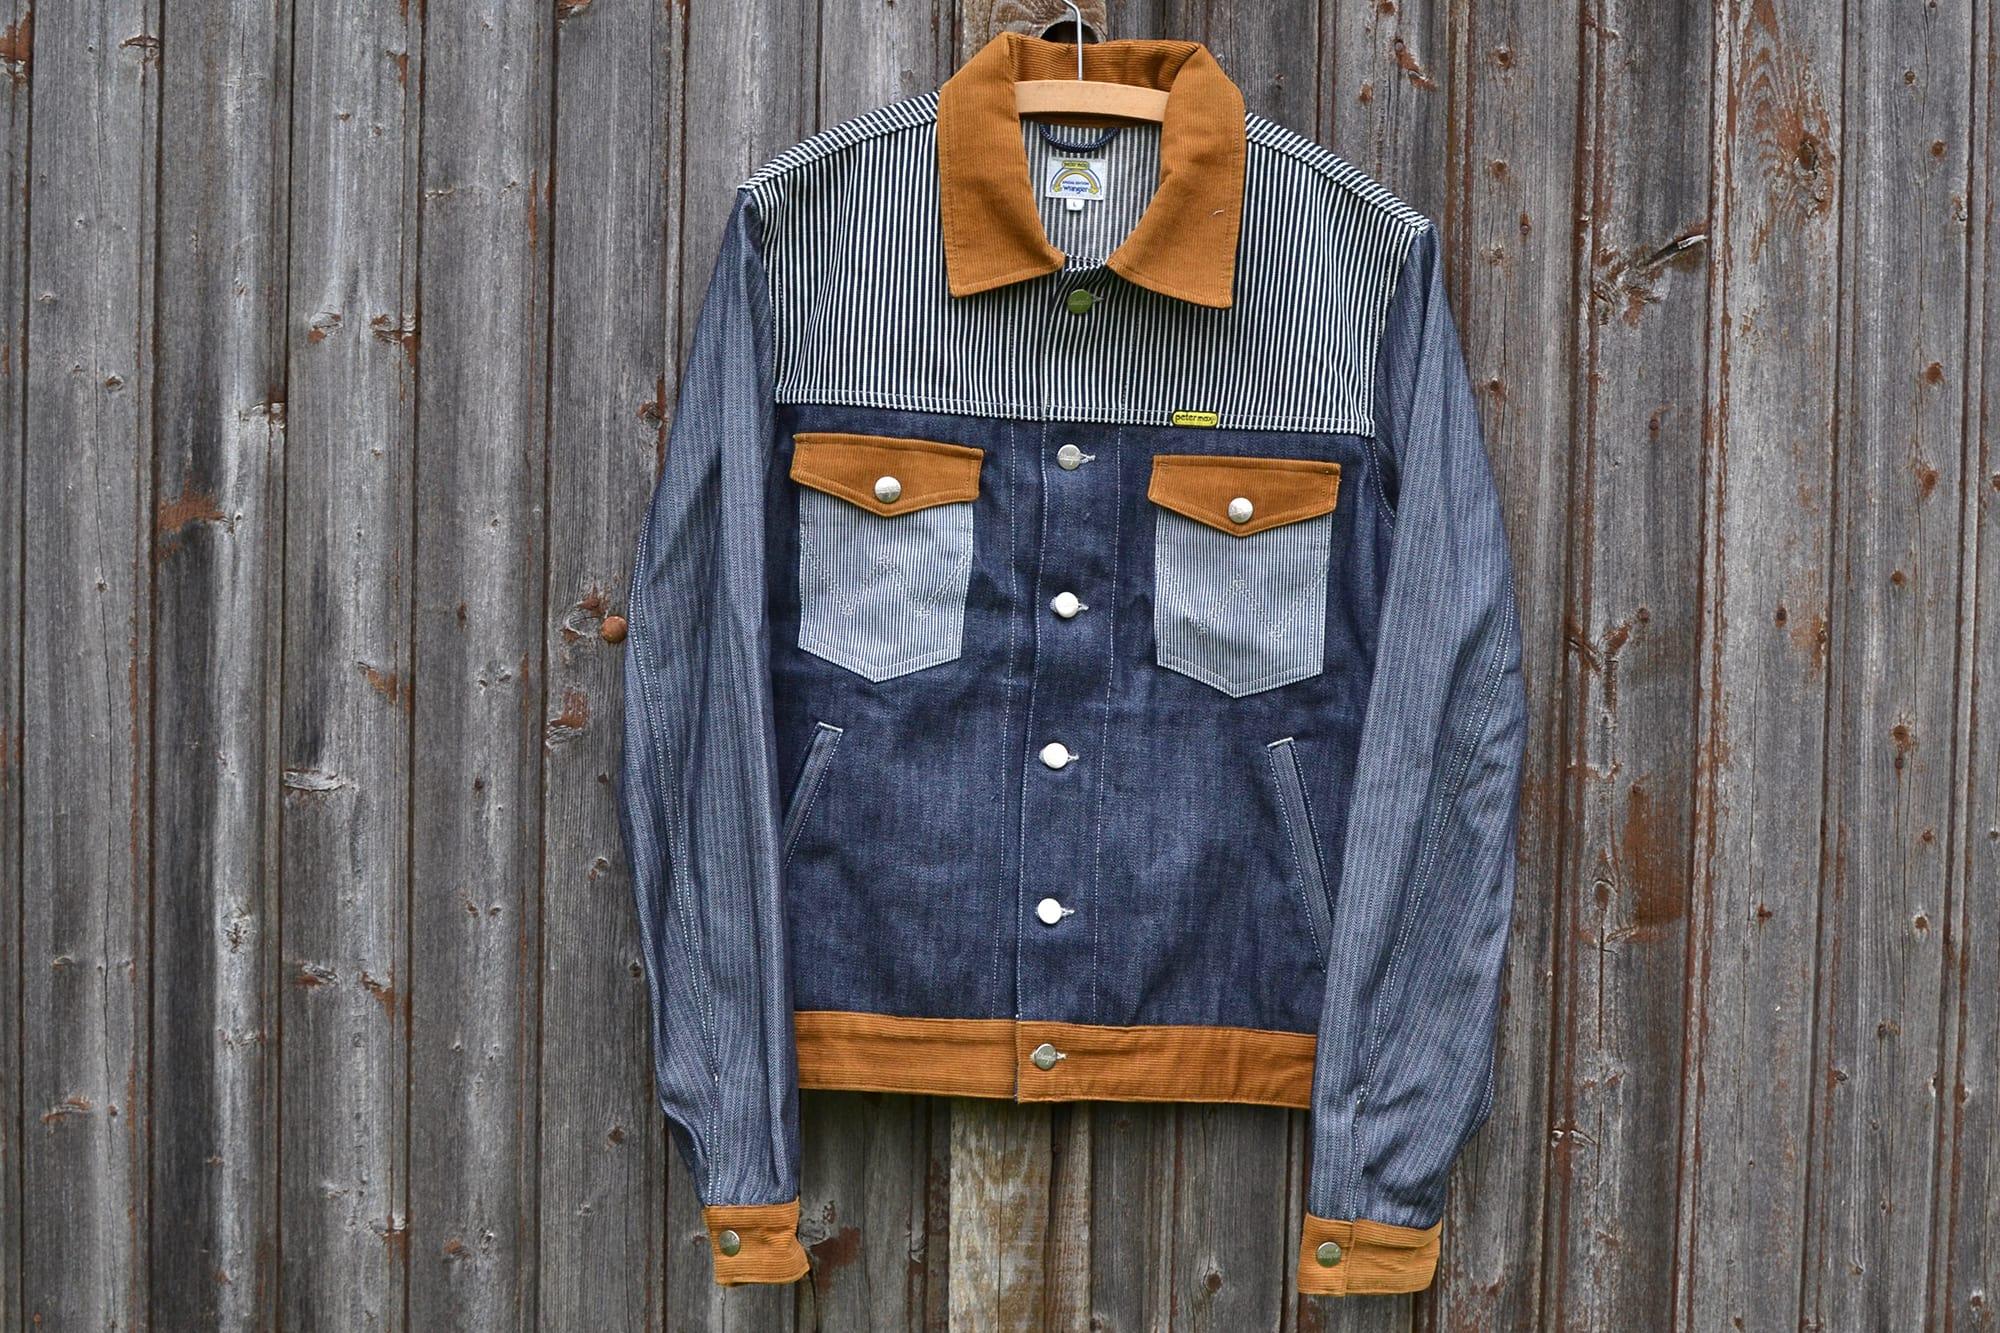 Wrangler x Peter Max mixed patchwork trucker jacket